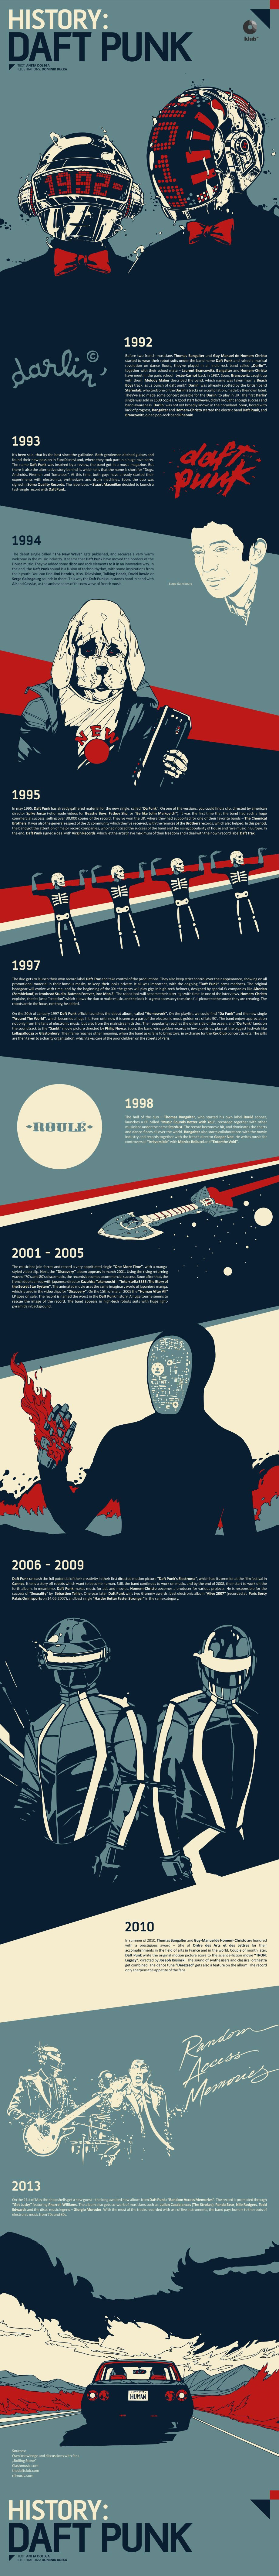 daft punk infographic